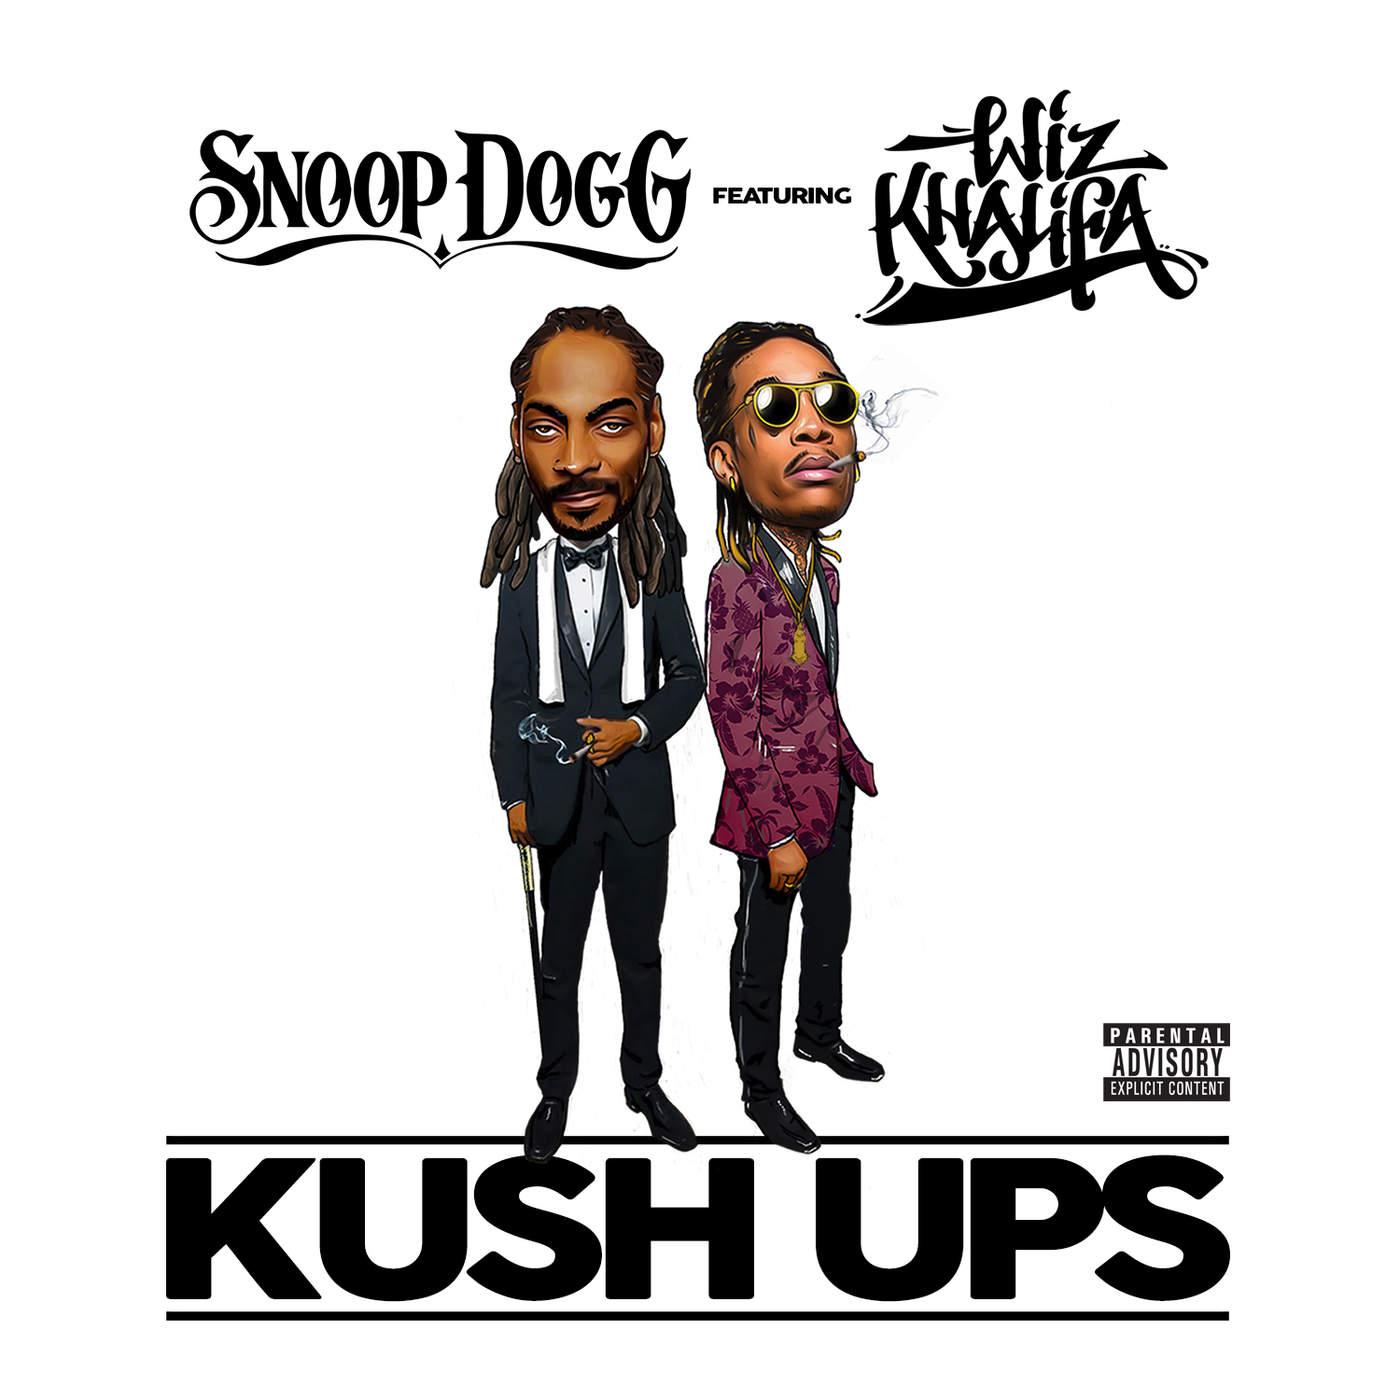 Snoop Dogg feat. Wiz Khalifa - Kush Ups (2016)